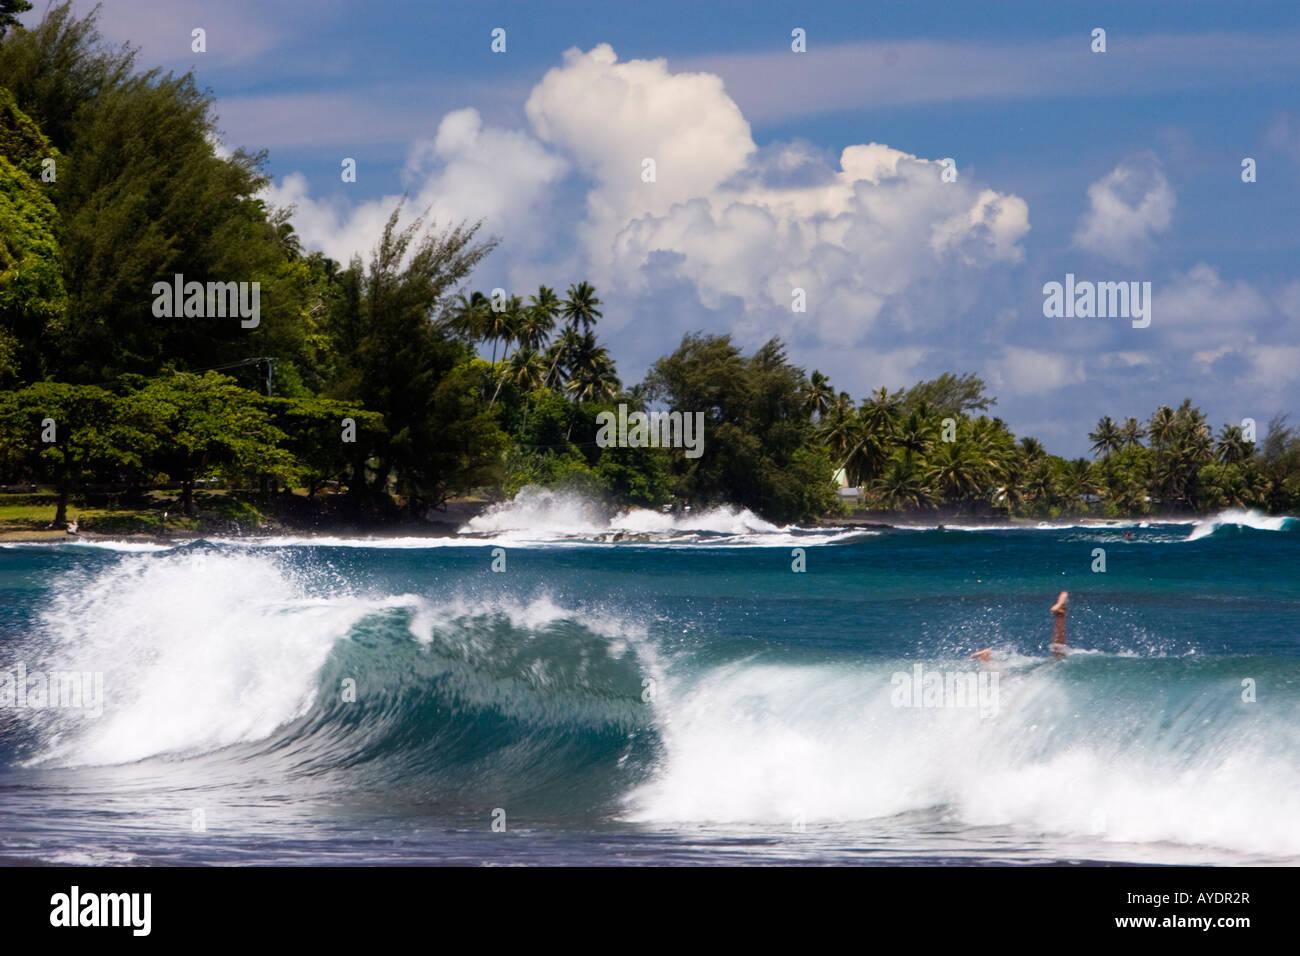 Big waves at Tahiti beach turn people upside down - Stock Image